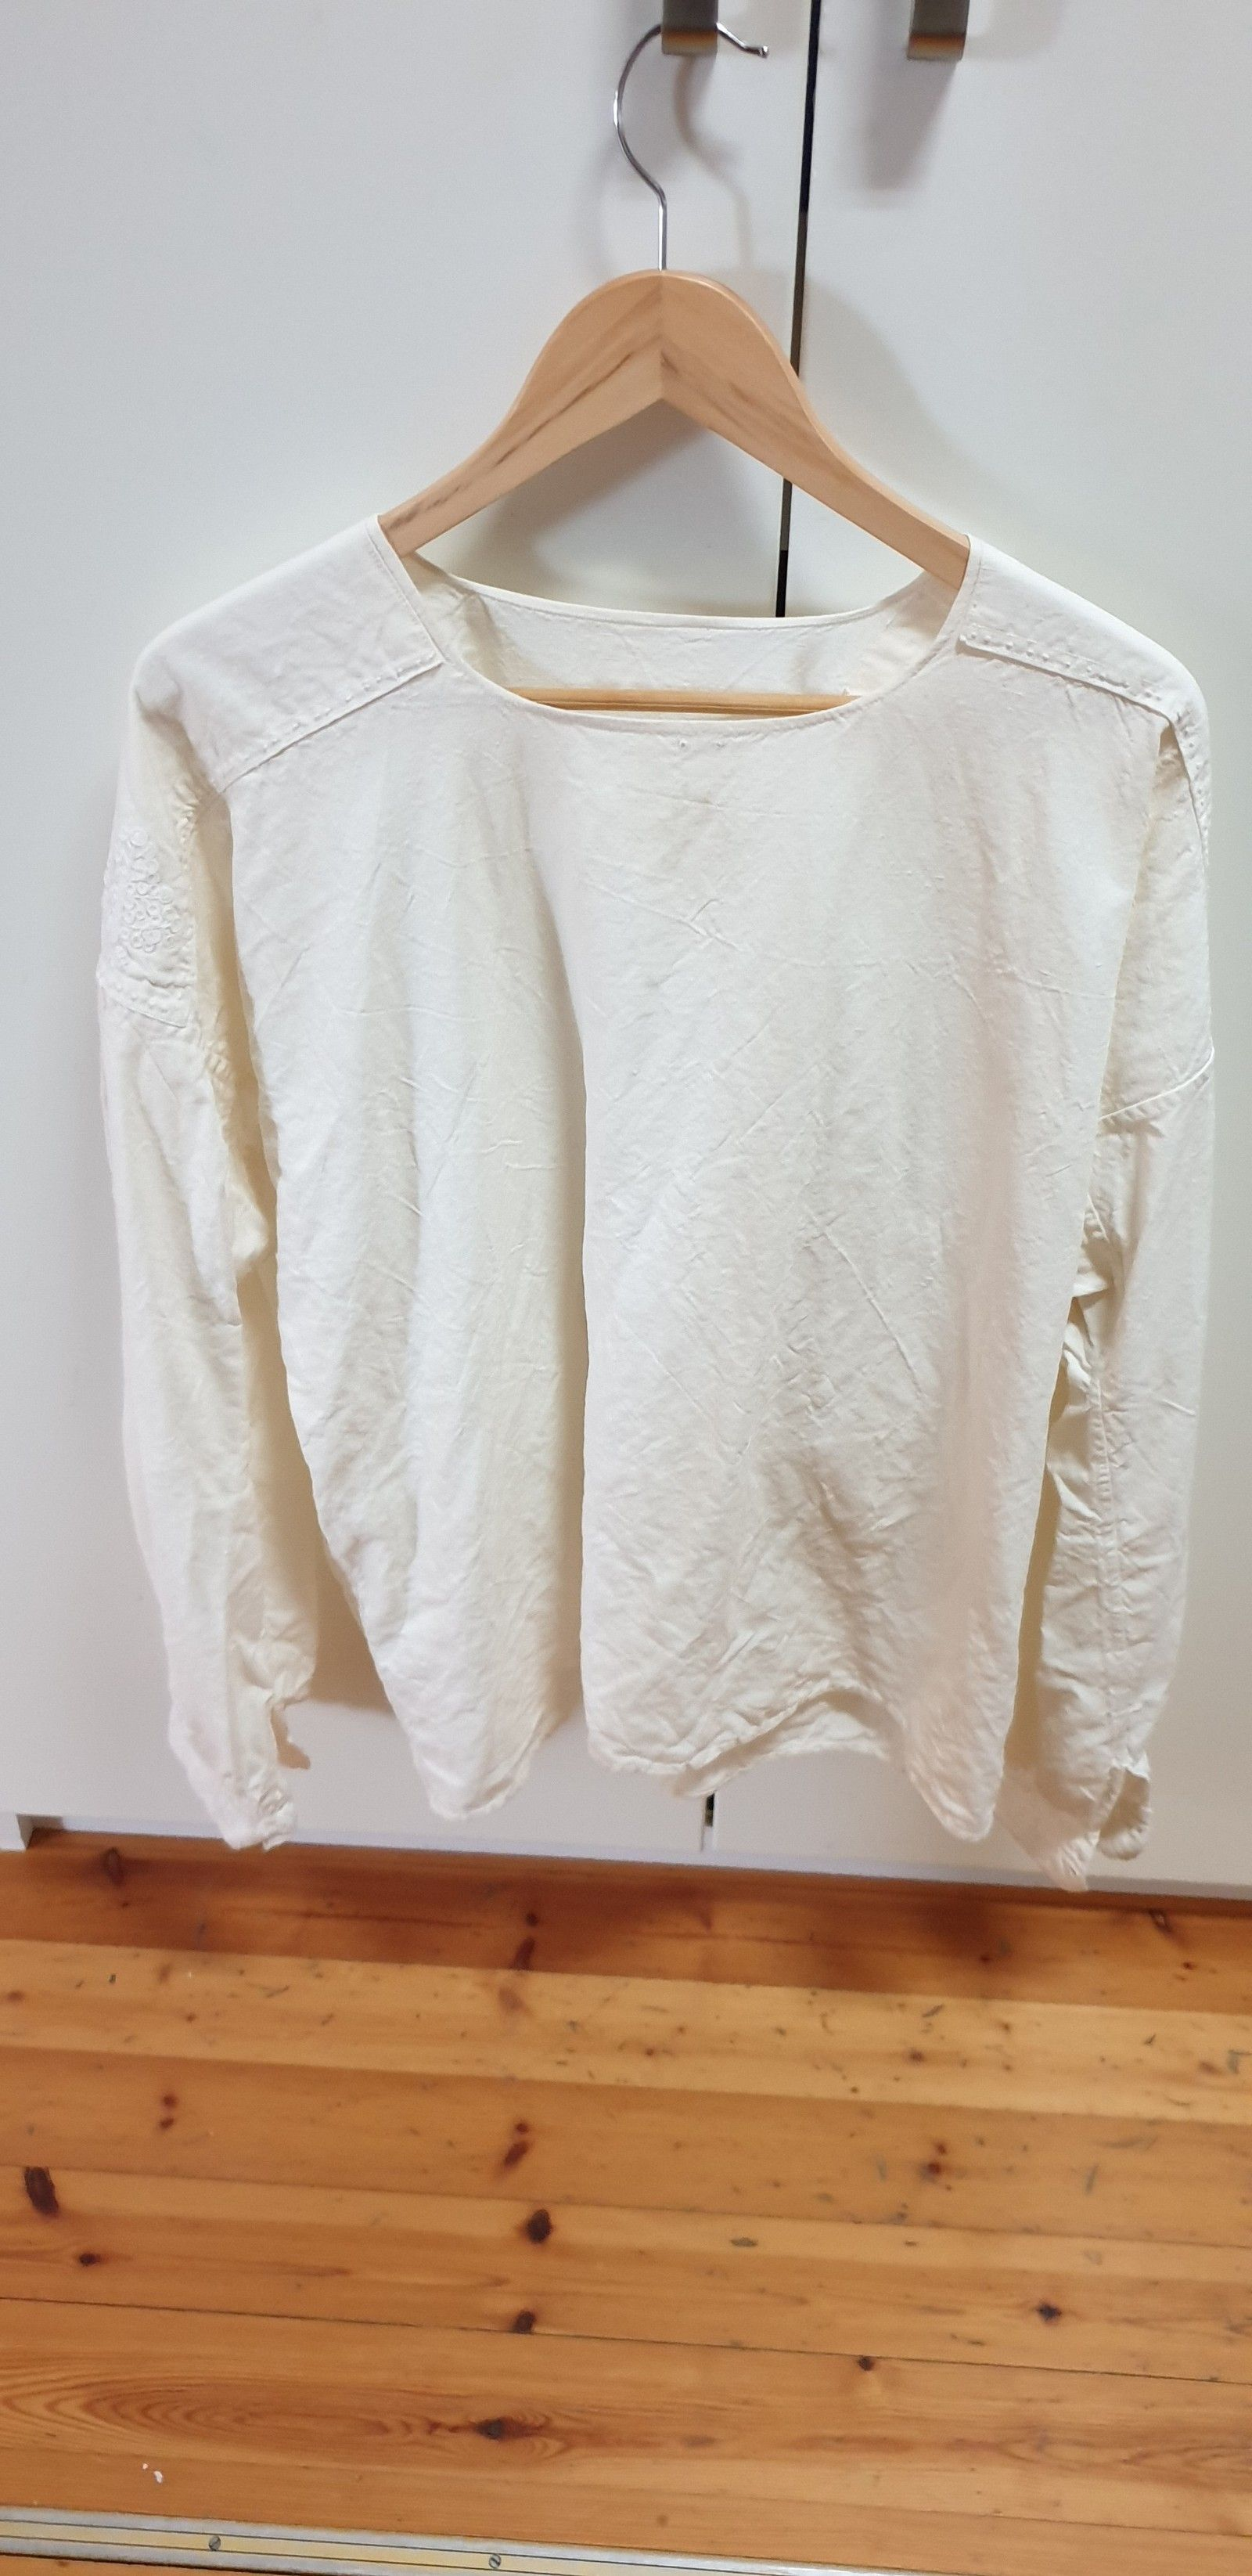 2) Bunadskjorte i lin, Aaseth skjorta til østerdalsbunad